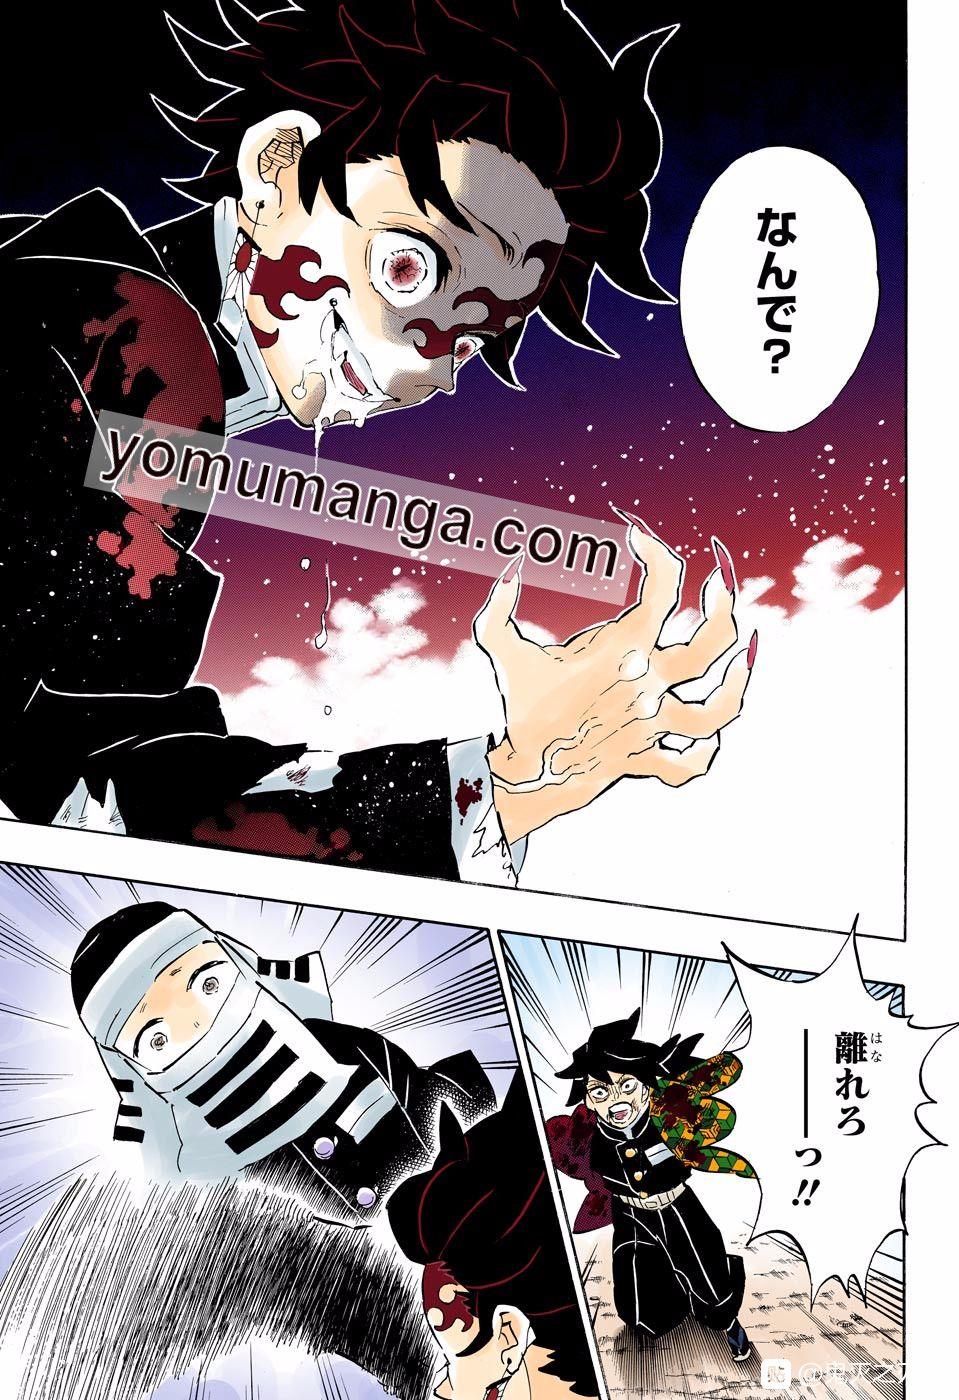 manga kimetsu no yaiba 201 raw colored video 漫画 滅 ドラゴンボール 漫画